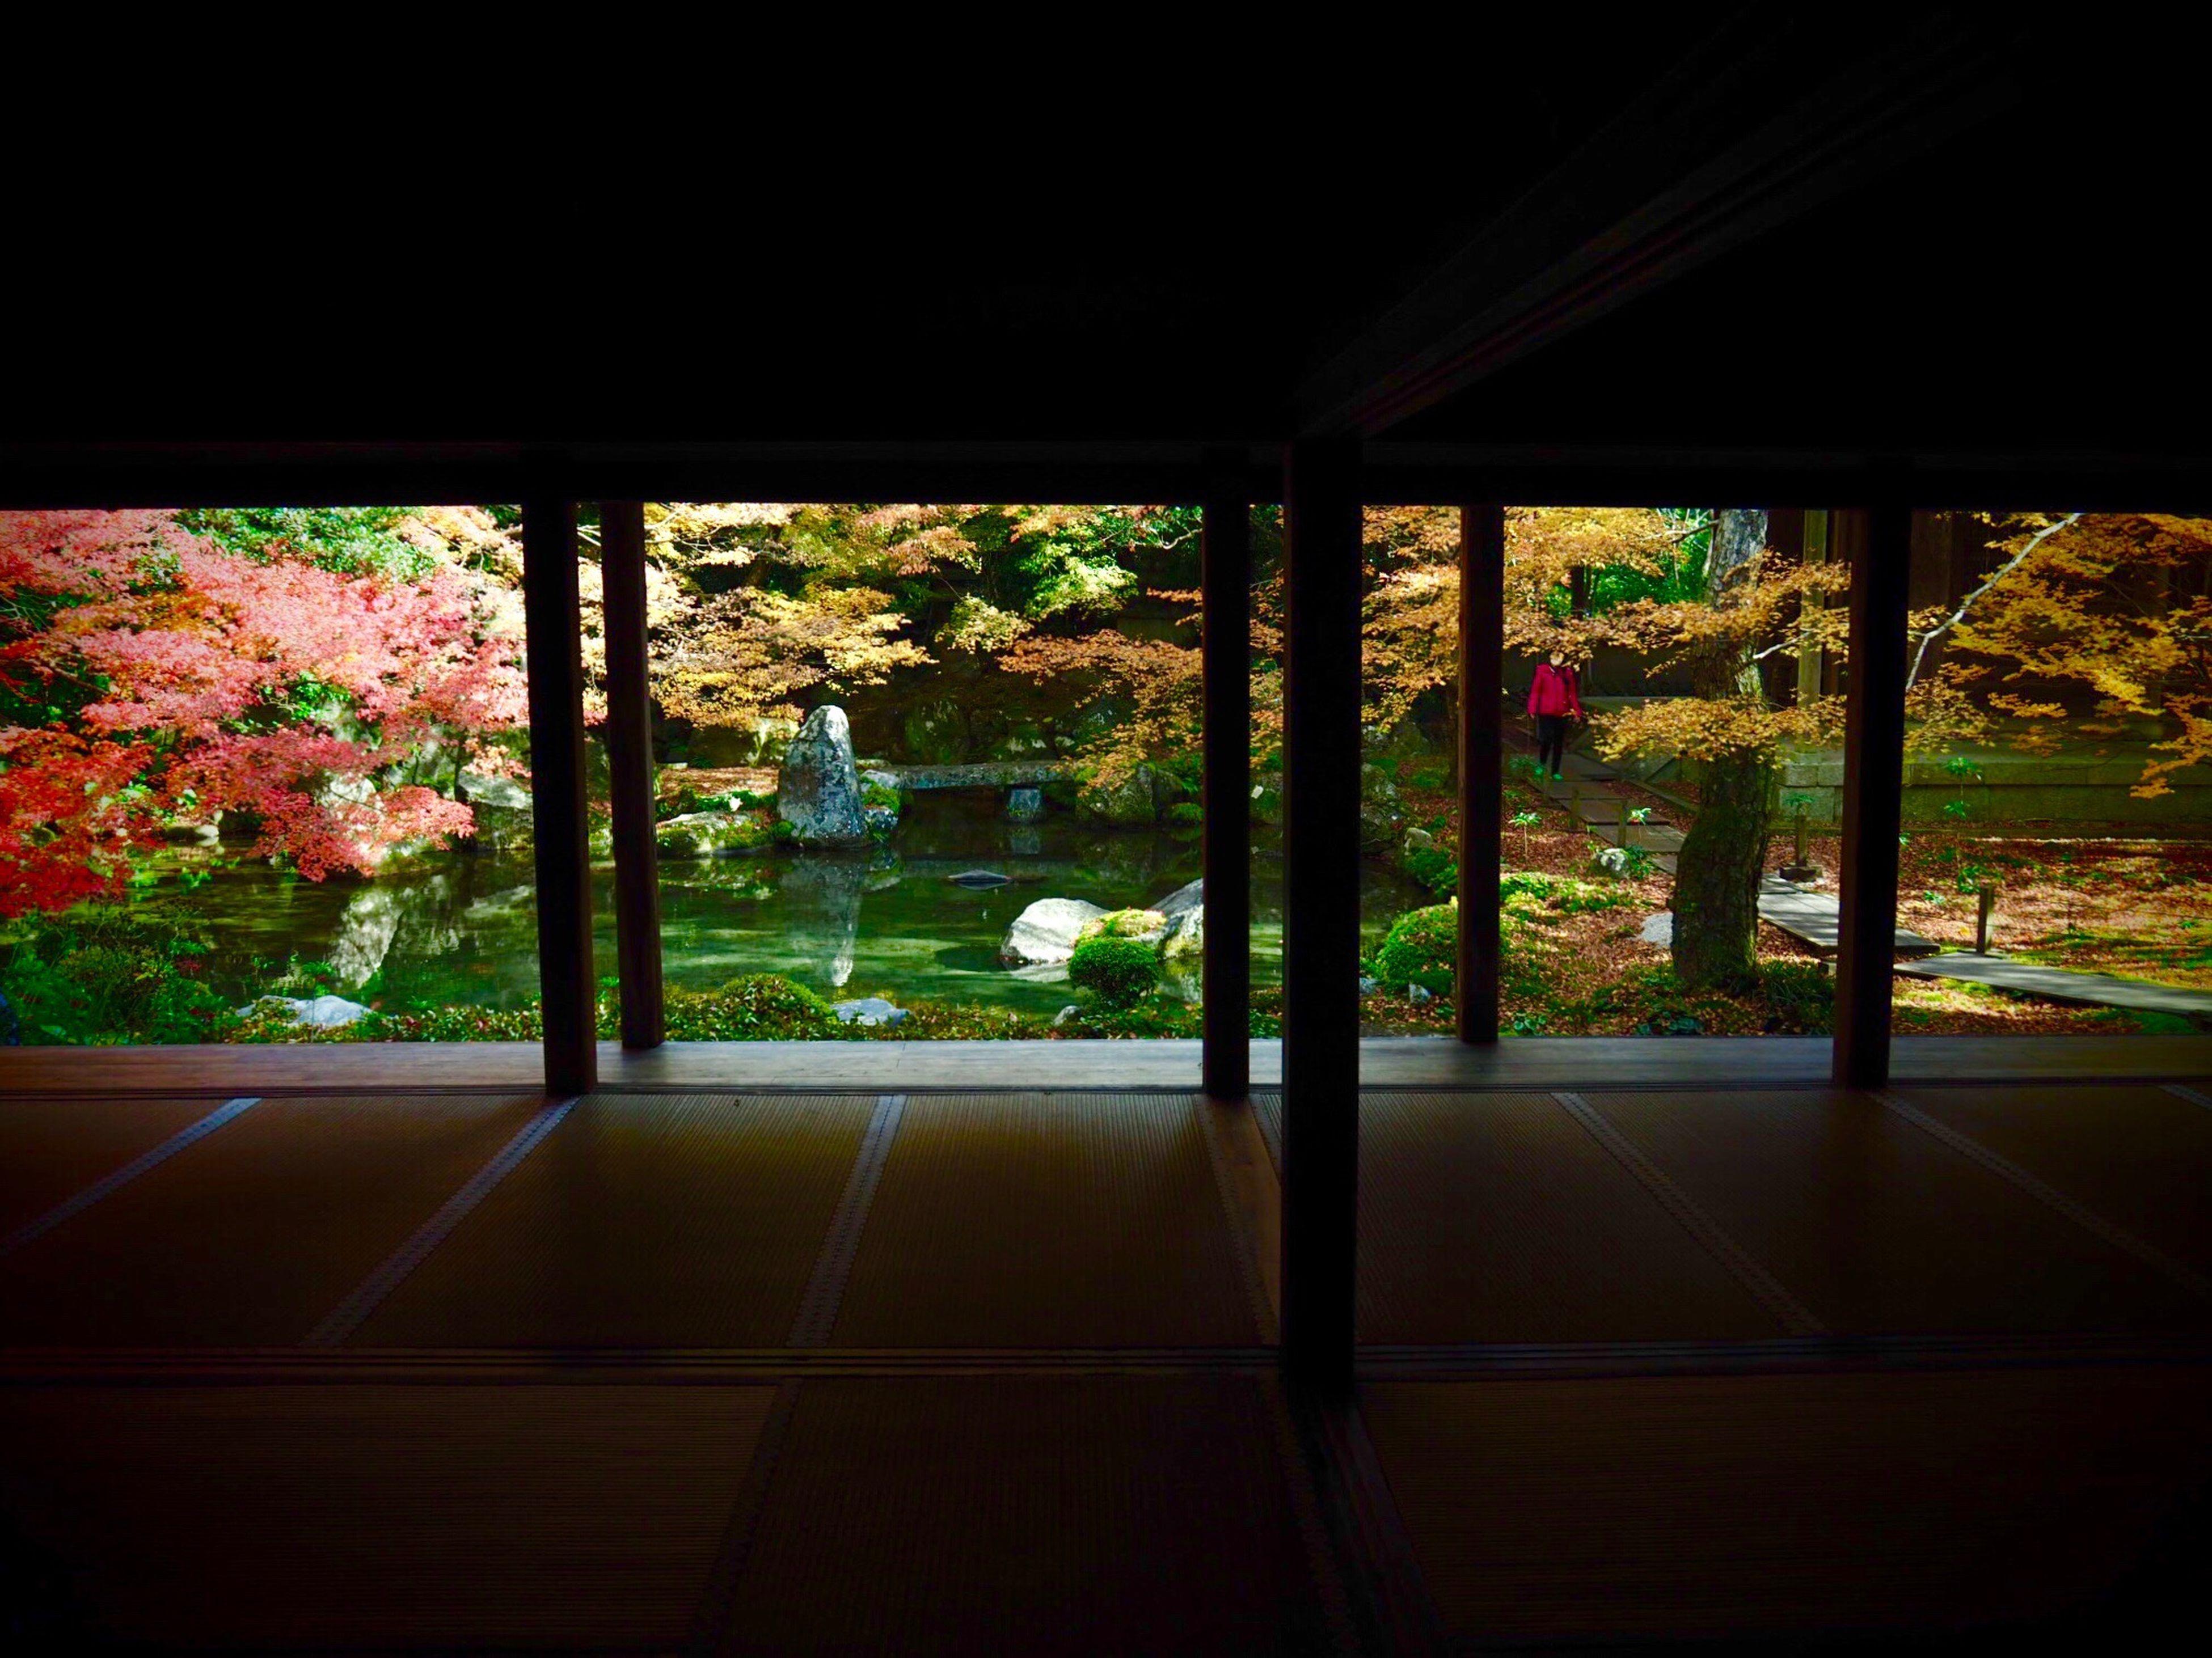 Kyoto Japan ASIA Yase Rengeji Temple Garden Courtyard  Architecture Beauty In Nature Nature Tree Autumn Olympus PEN-F